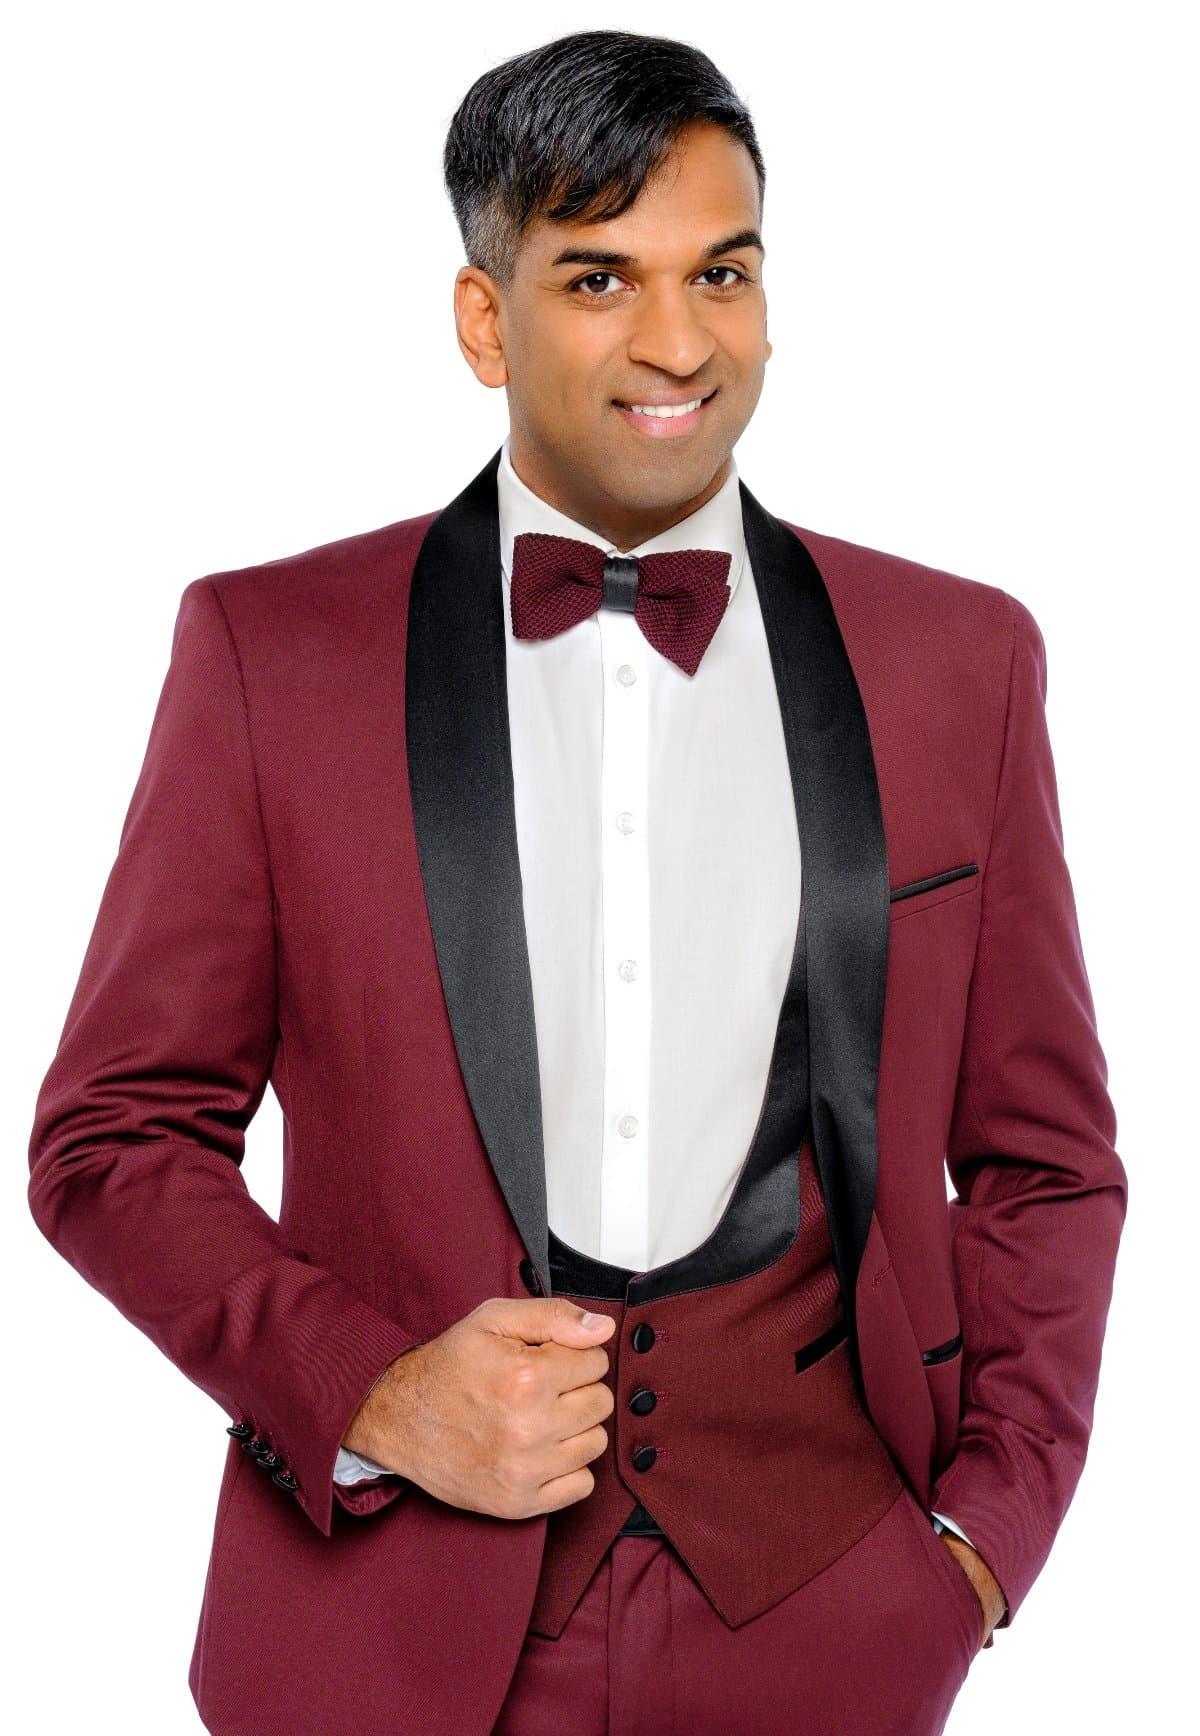 Ramesh Nair - Neuer Choreograf bei den Dancing Stars 2019